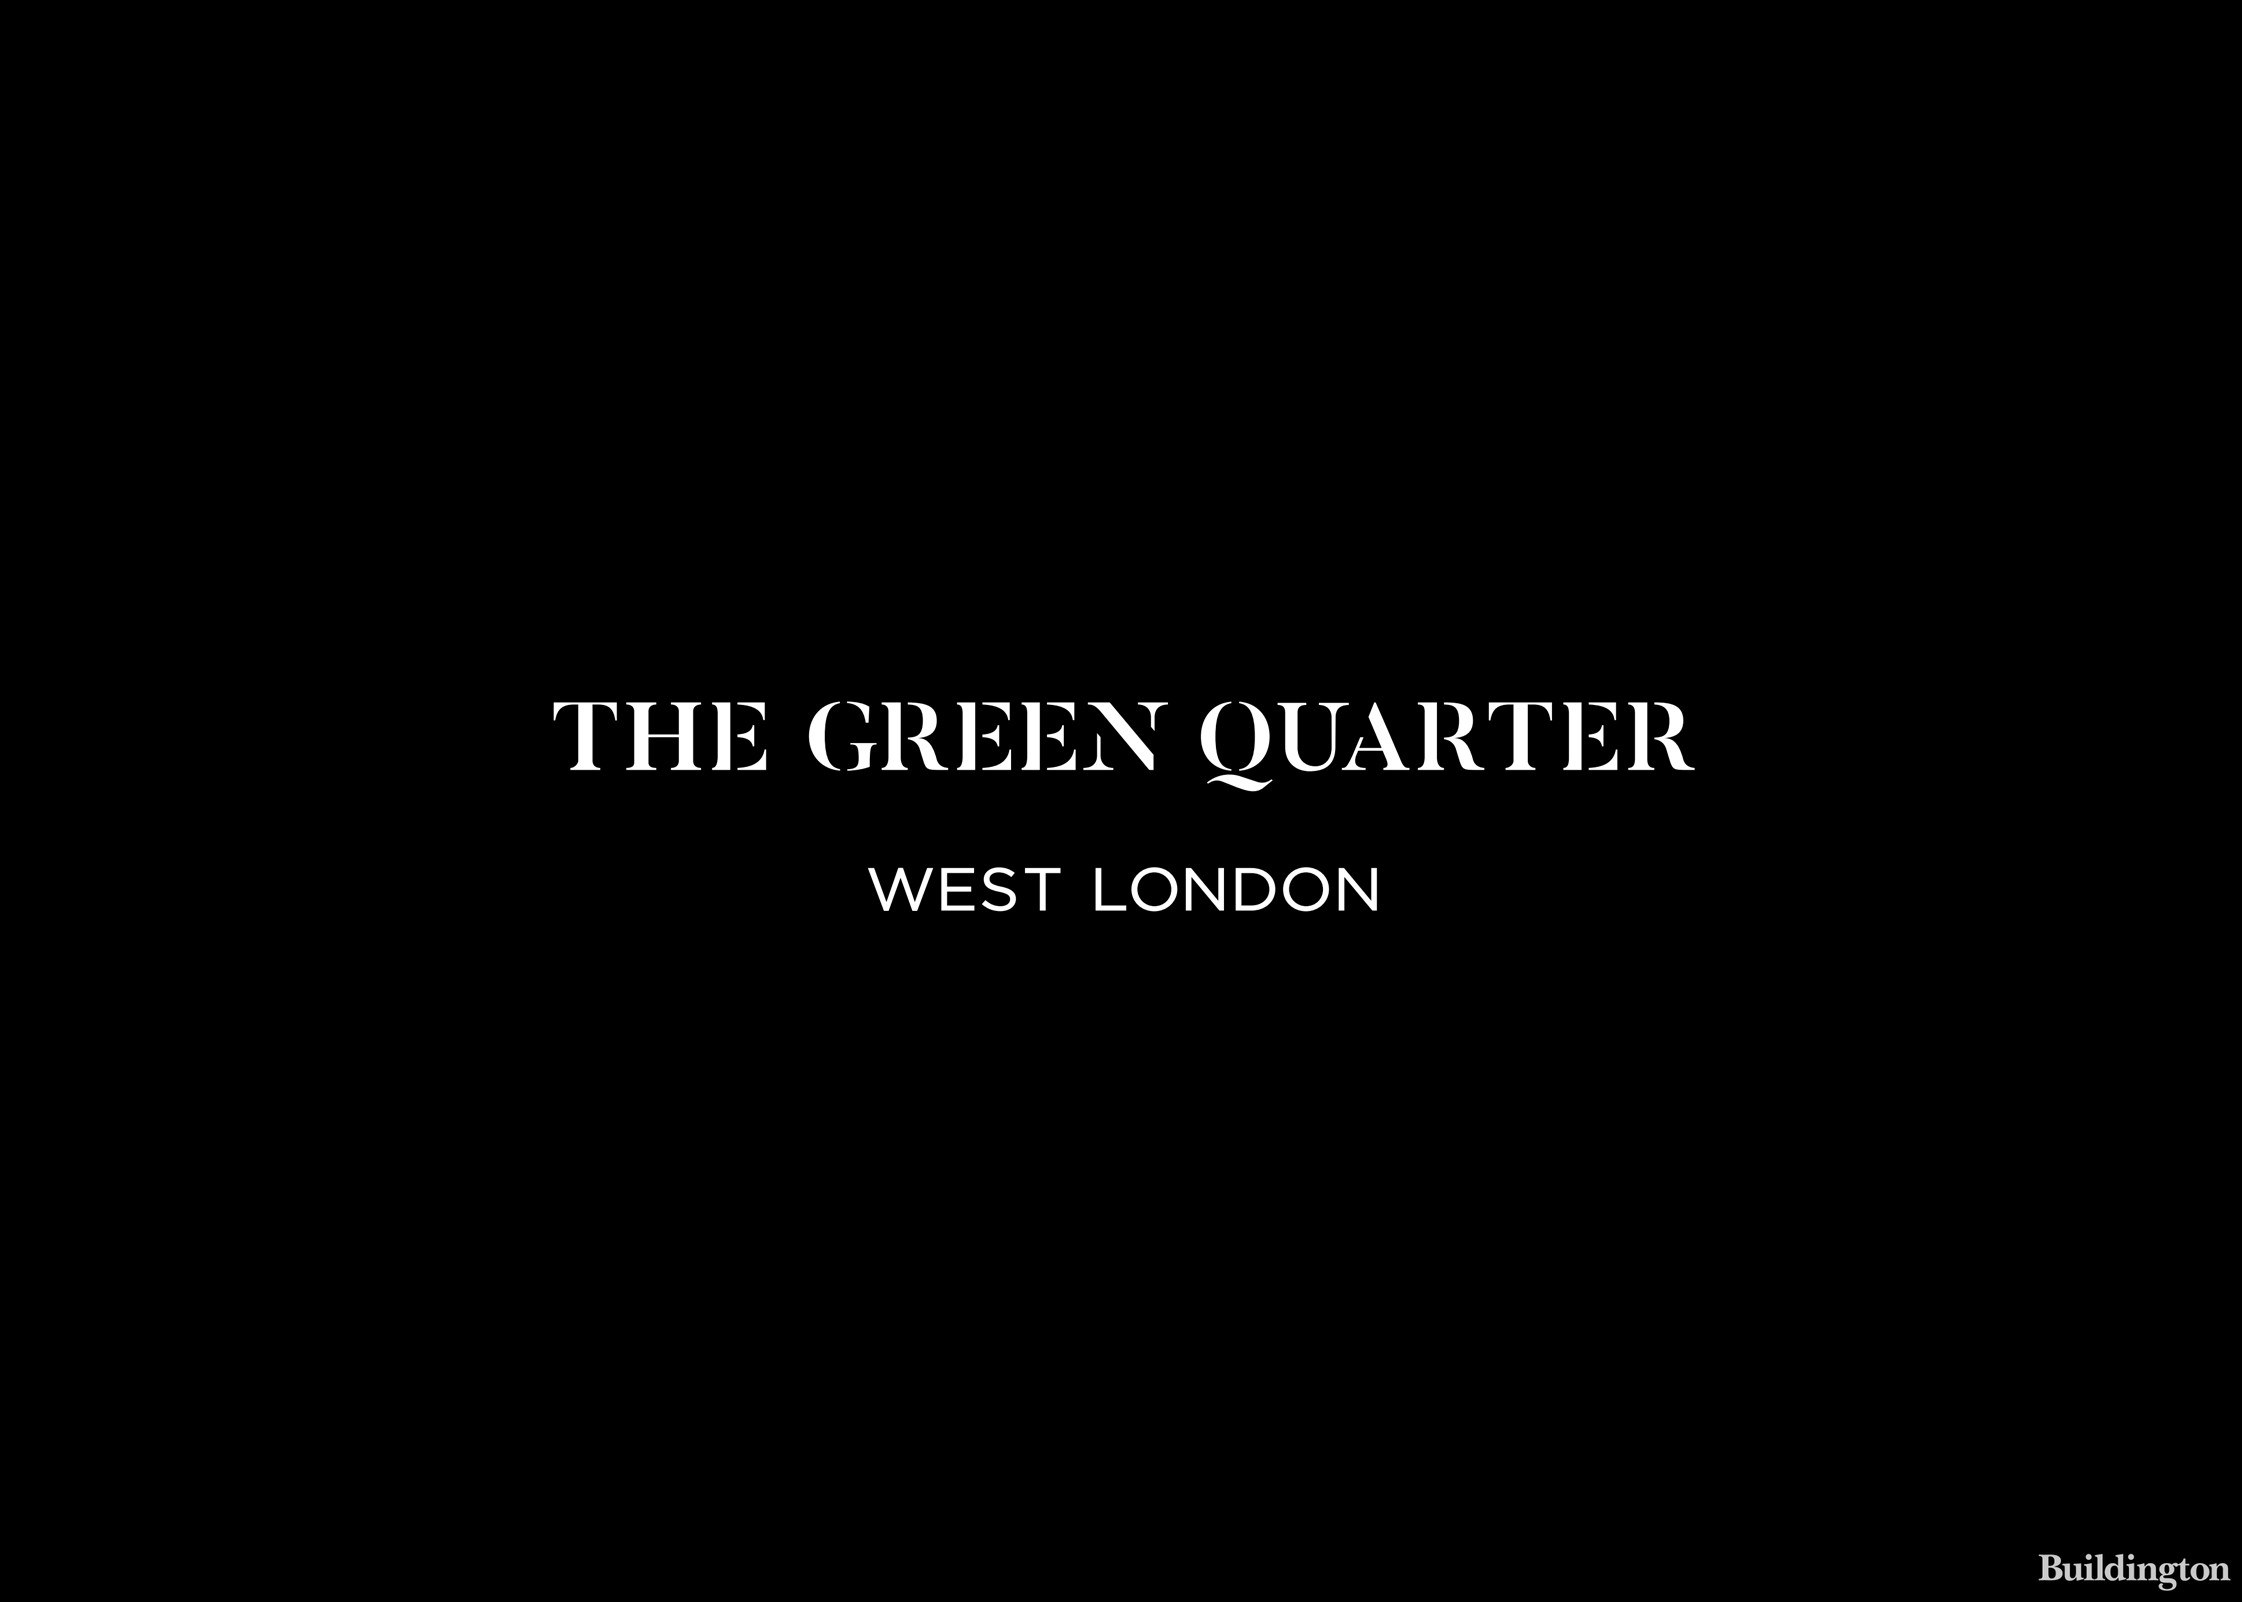 The Green Quarter development by Berkeley